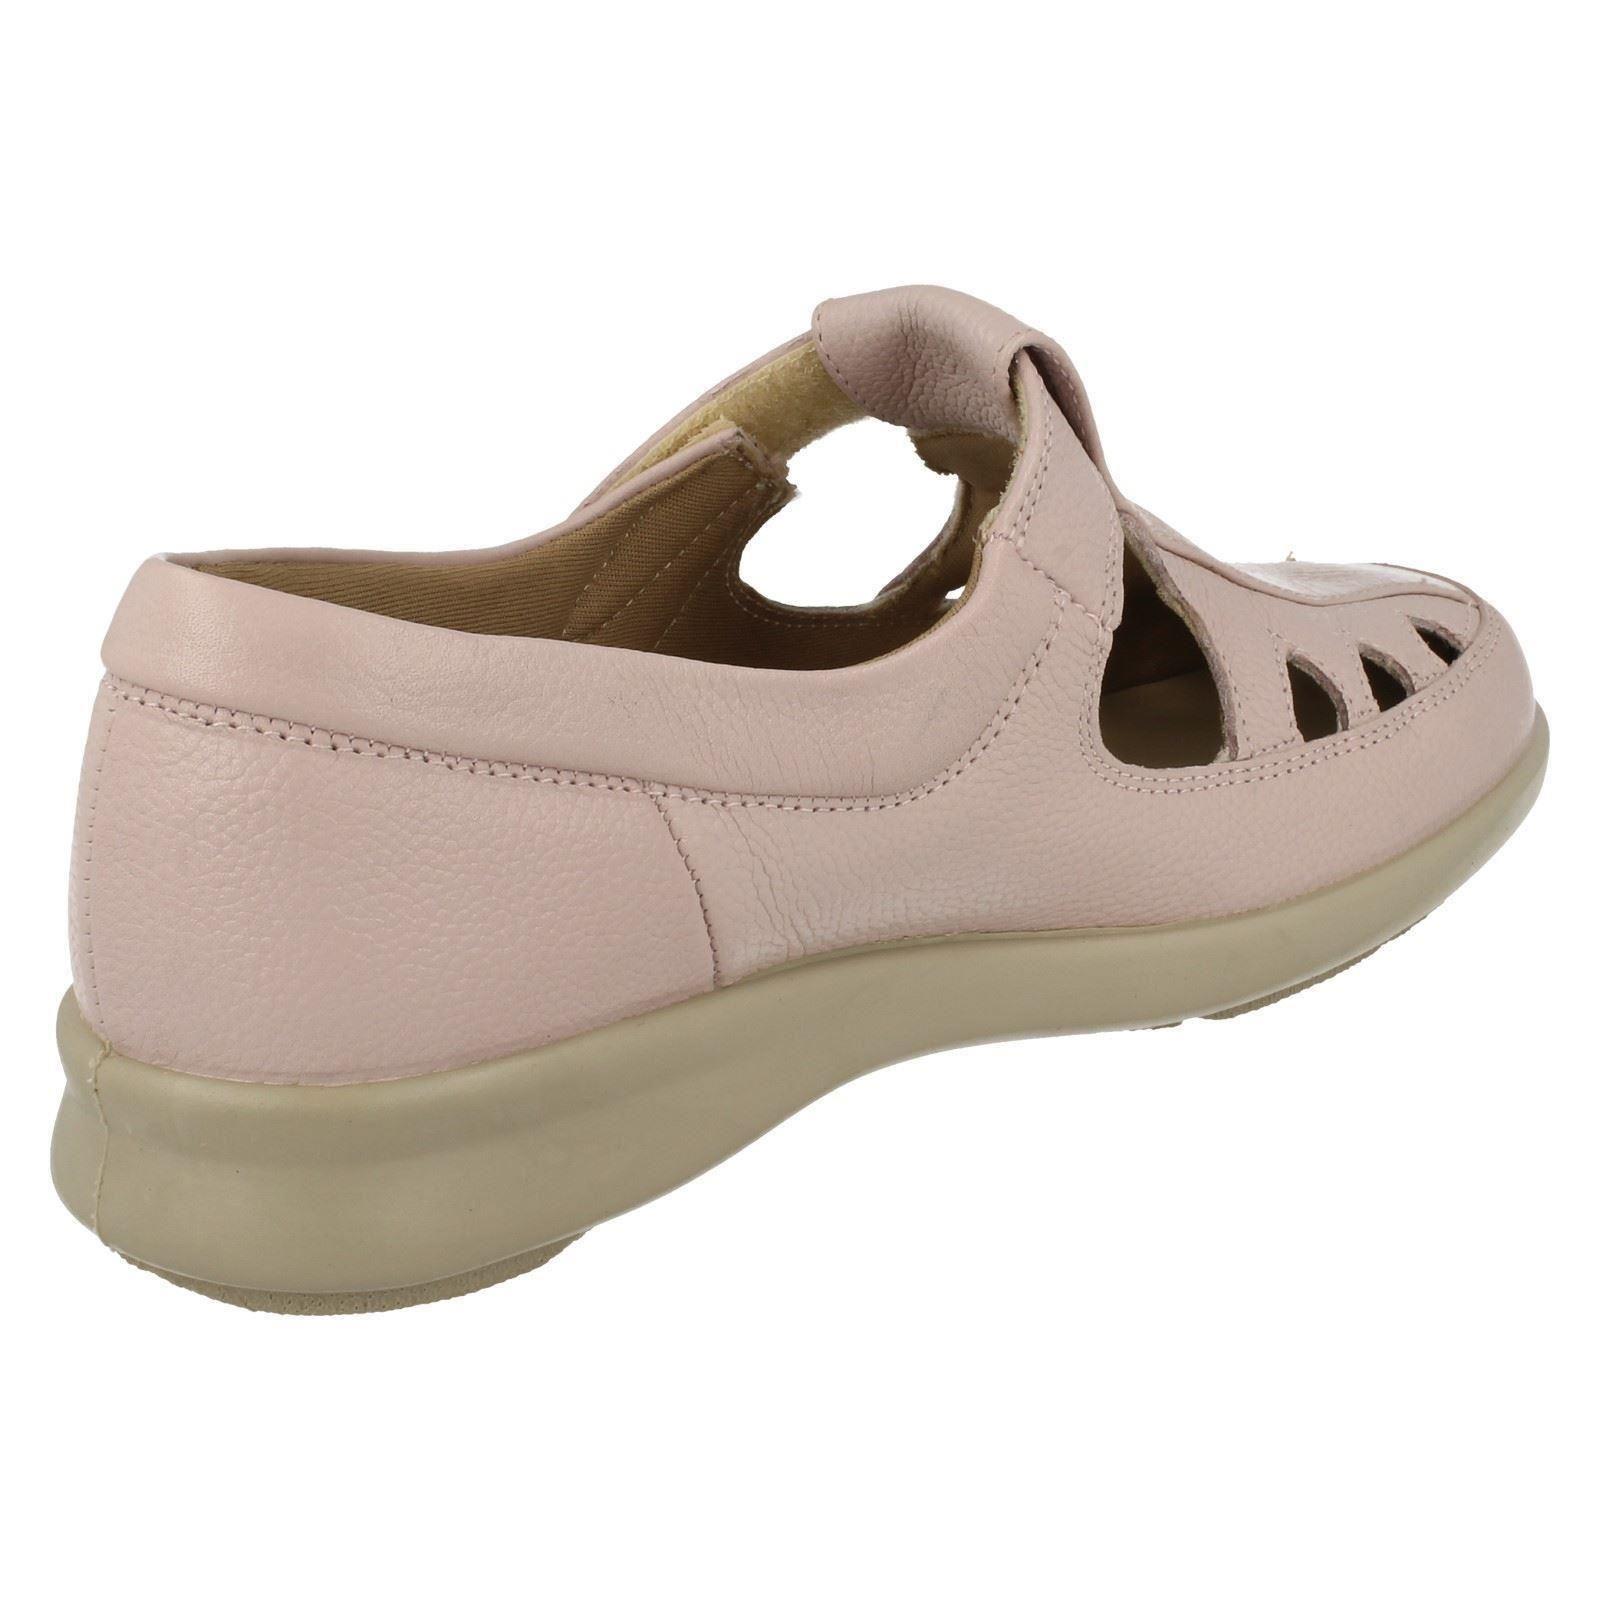 Señoras fácil B pensamiento Informal Zapatos